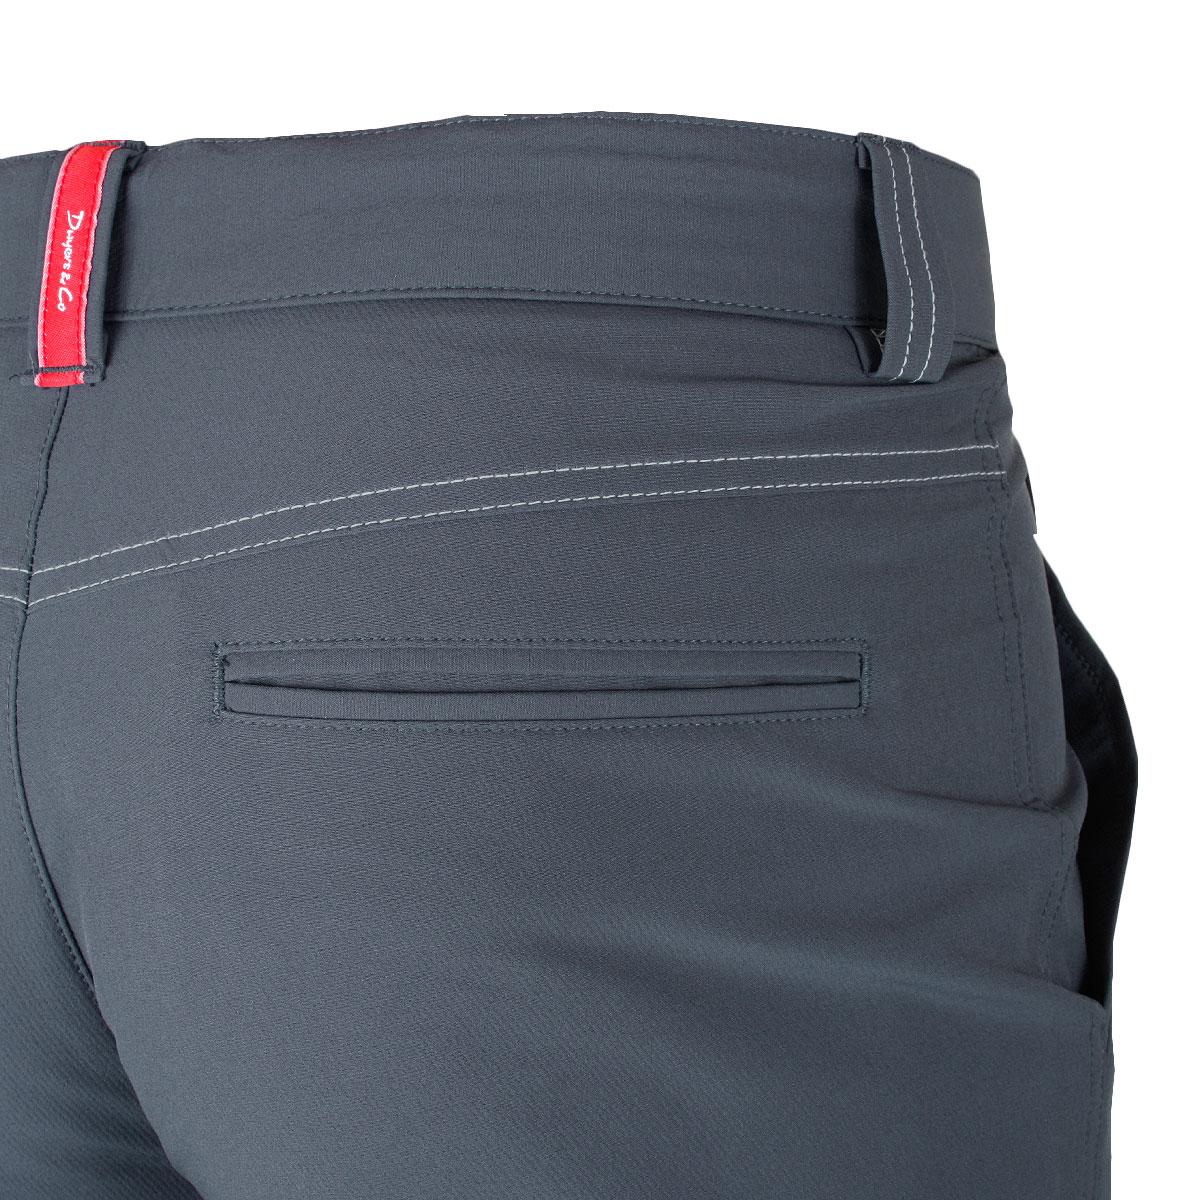 Dwyers-amp-Co-Mens-Golf-Trousers-Micro-Tech-Pant-43-OFF-RRP thumbnail 9